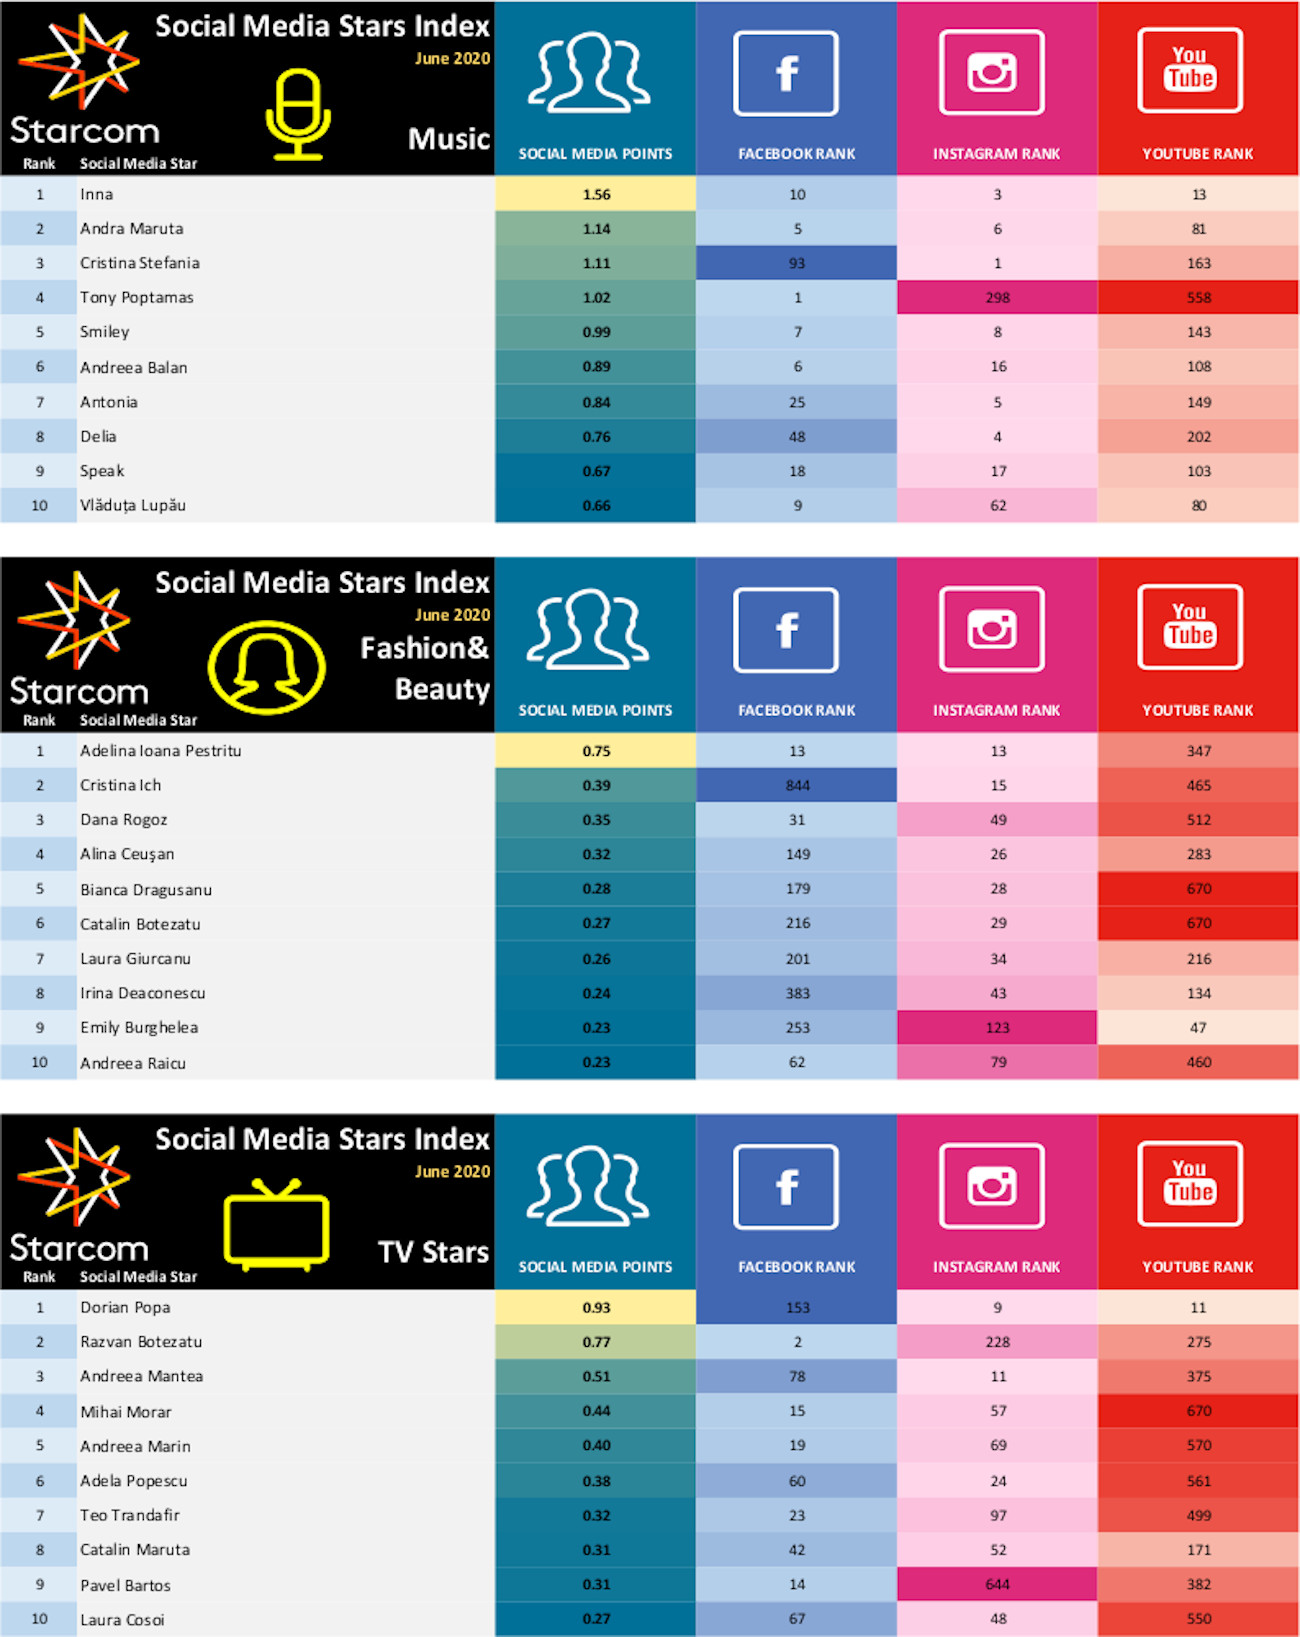 Starcom Social Media Index June 2020 2